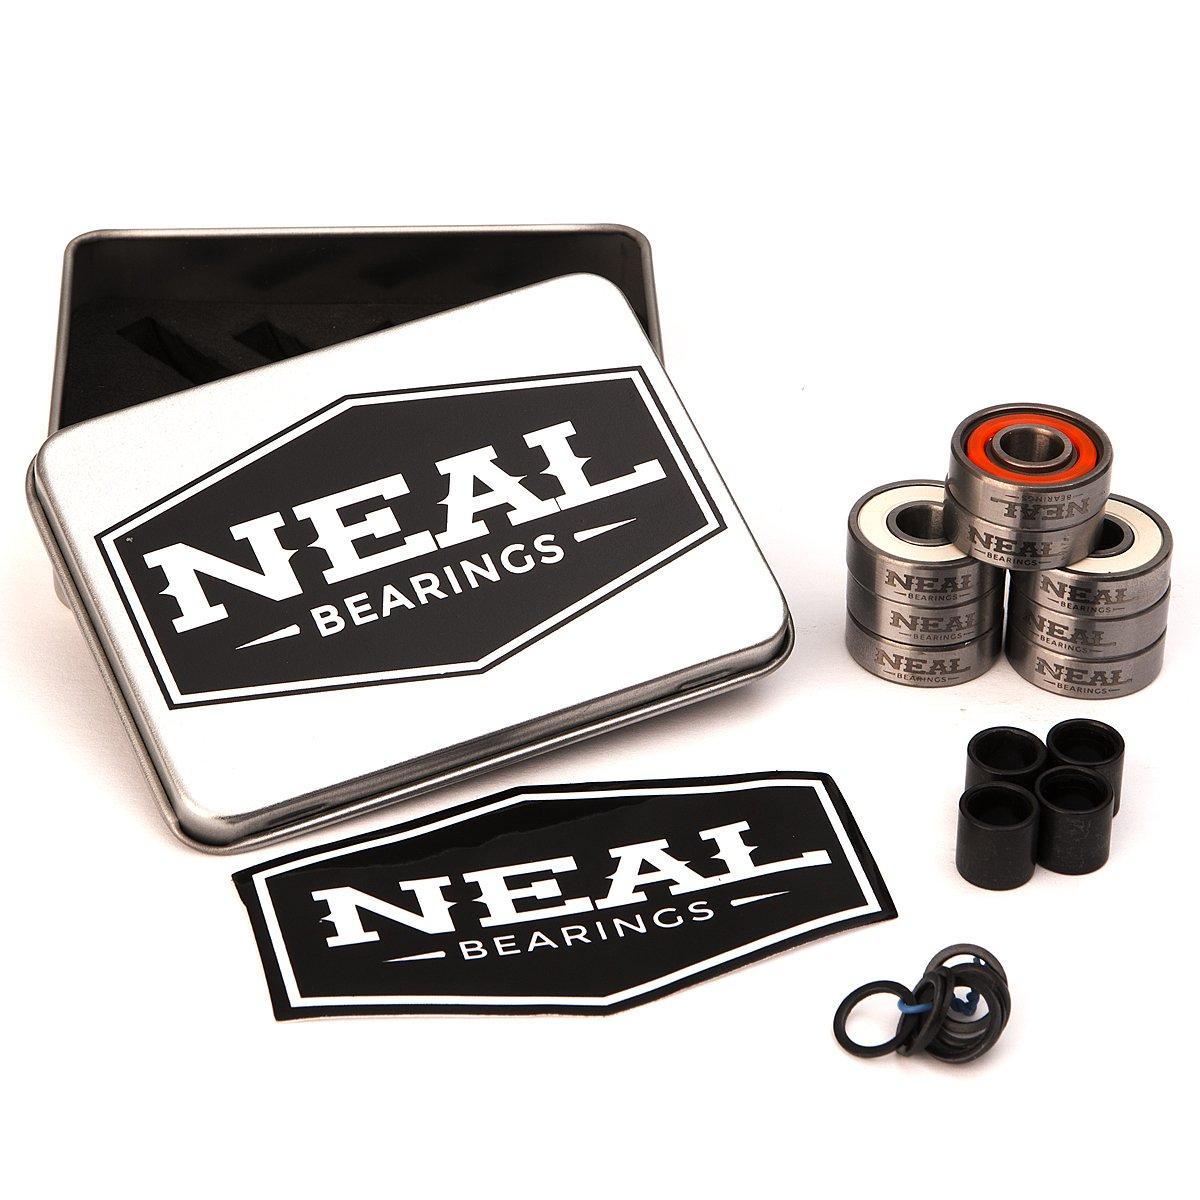 Neal Precision Hurricane Skate Bearings 608rs - Skateboard - Longboard - Inline - Scooter. The Best Bearings Guaranteed. (Orange/Swiss, 8 Pcs) by Neal Bearings